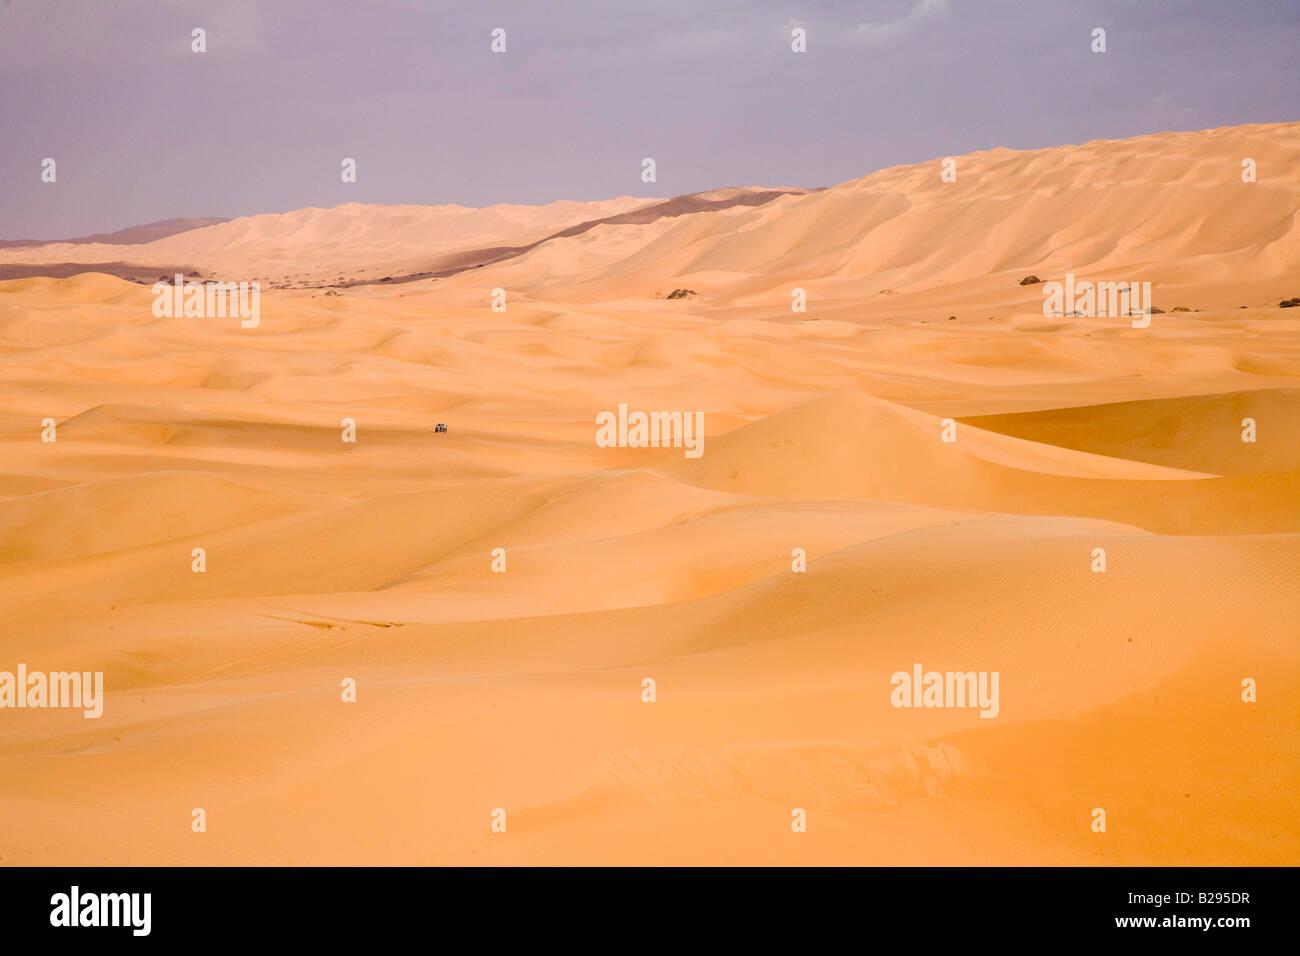 Libya Sahara Desert Dunes Date 25 01 2008 Ref ZB720 112781 0017 COMPULSORY CREDIT World Pictures Photoshot - Stock Image